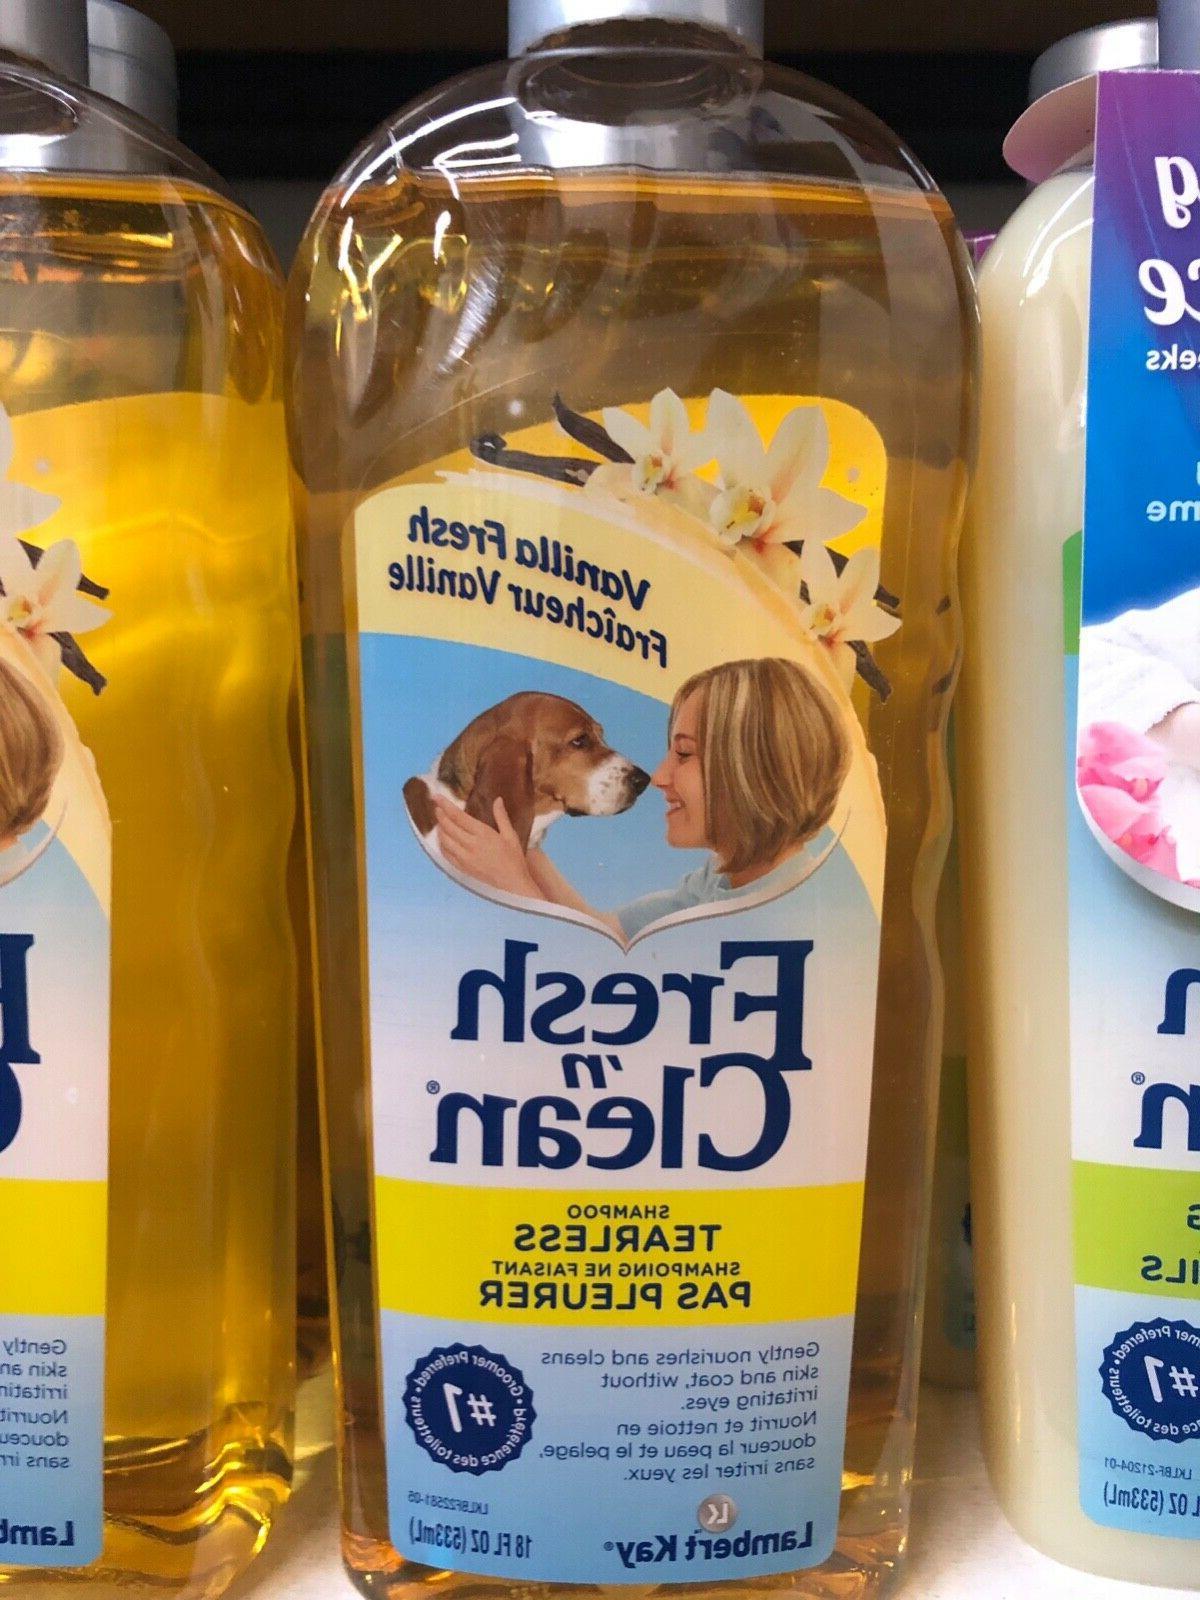 pet supplies shampoo